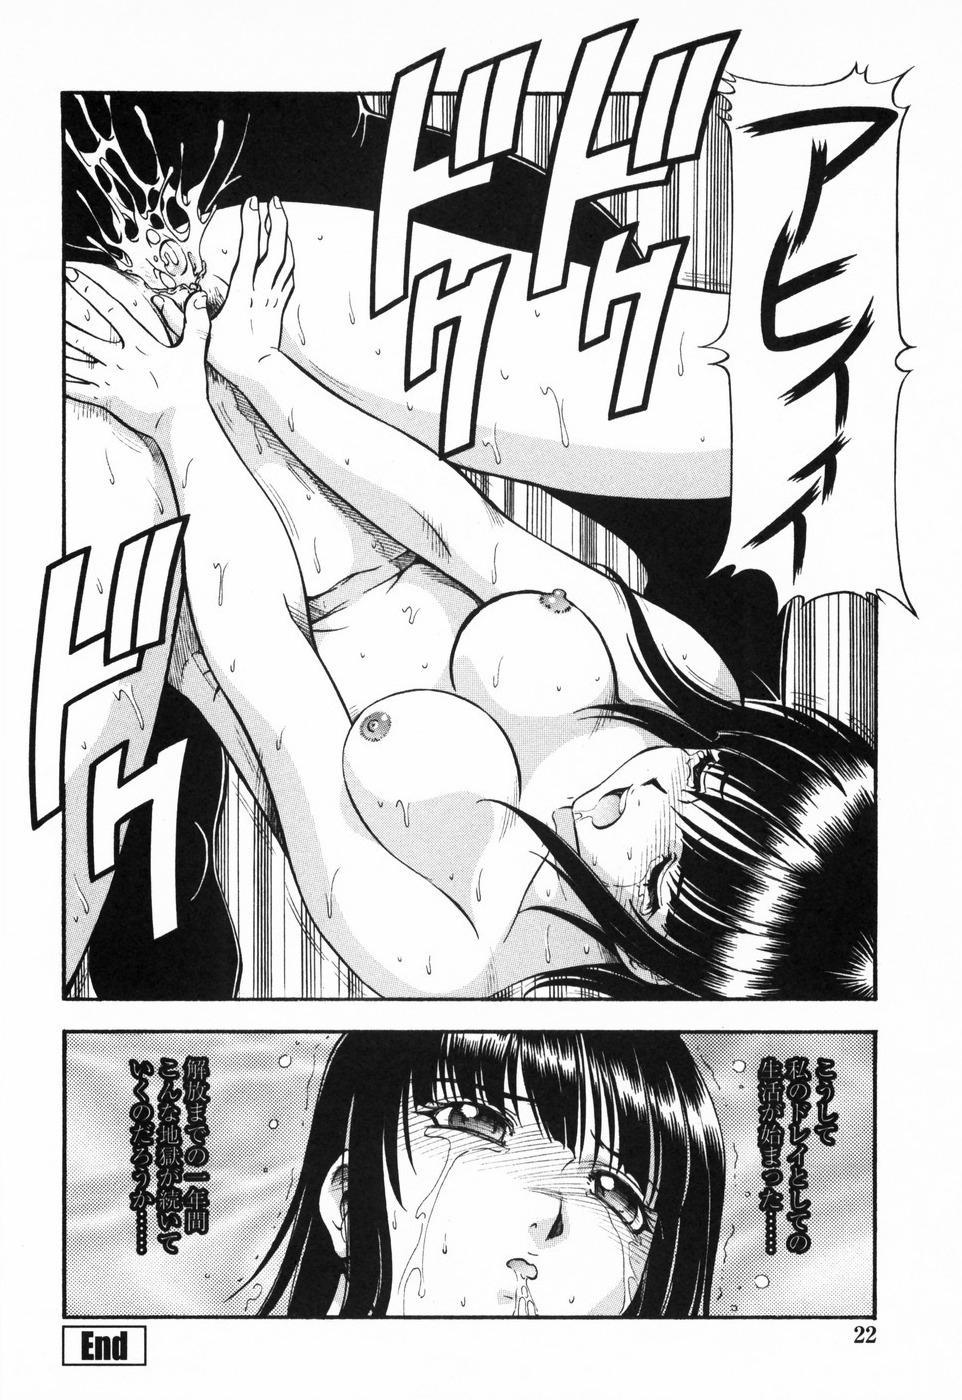 Kichiku Houteishiki - Equation of brutal person 27